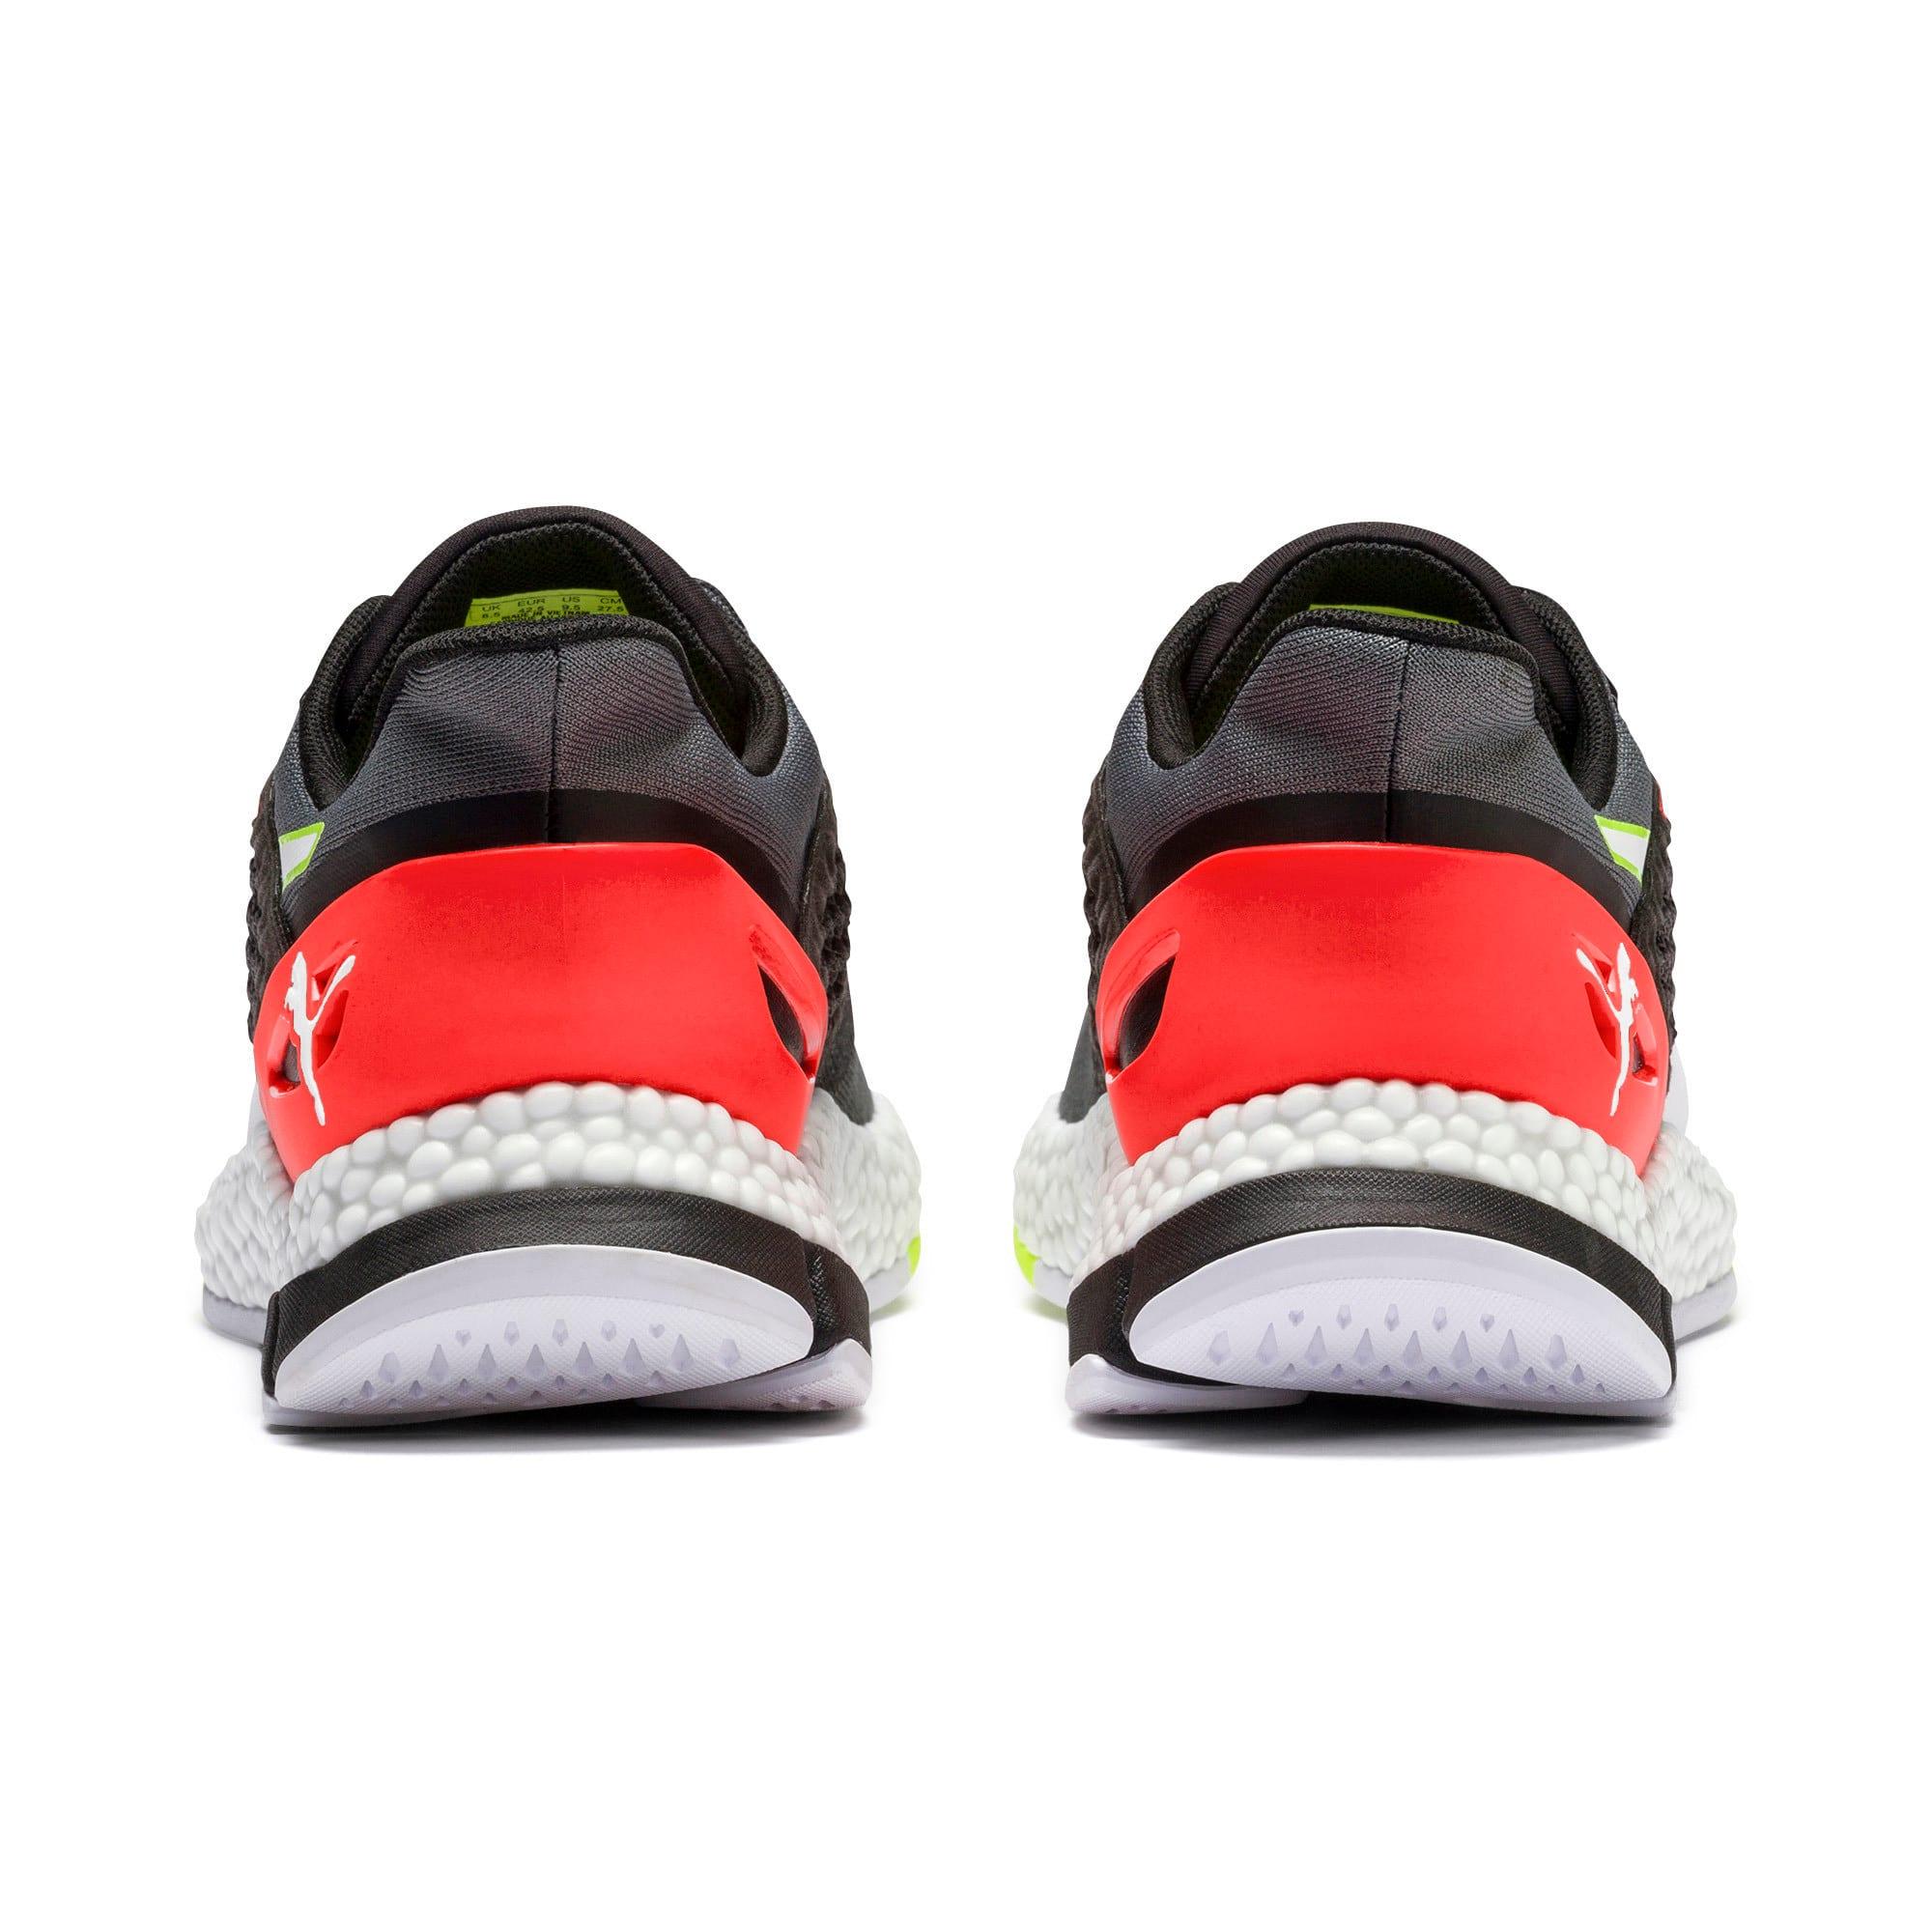 Thumbnail 4 of HYBRID NETFIT Astro Men's Running Shoes, CASTLEROCK-Puma Blck-Ngy Red, medium